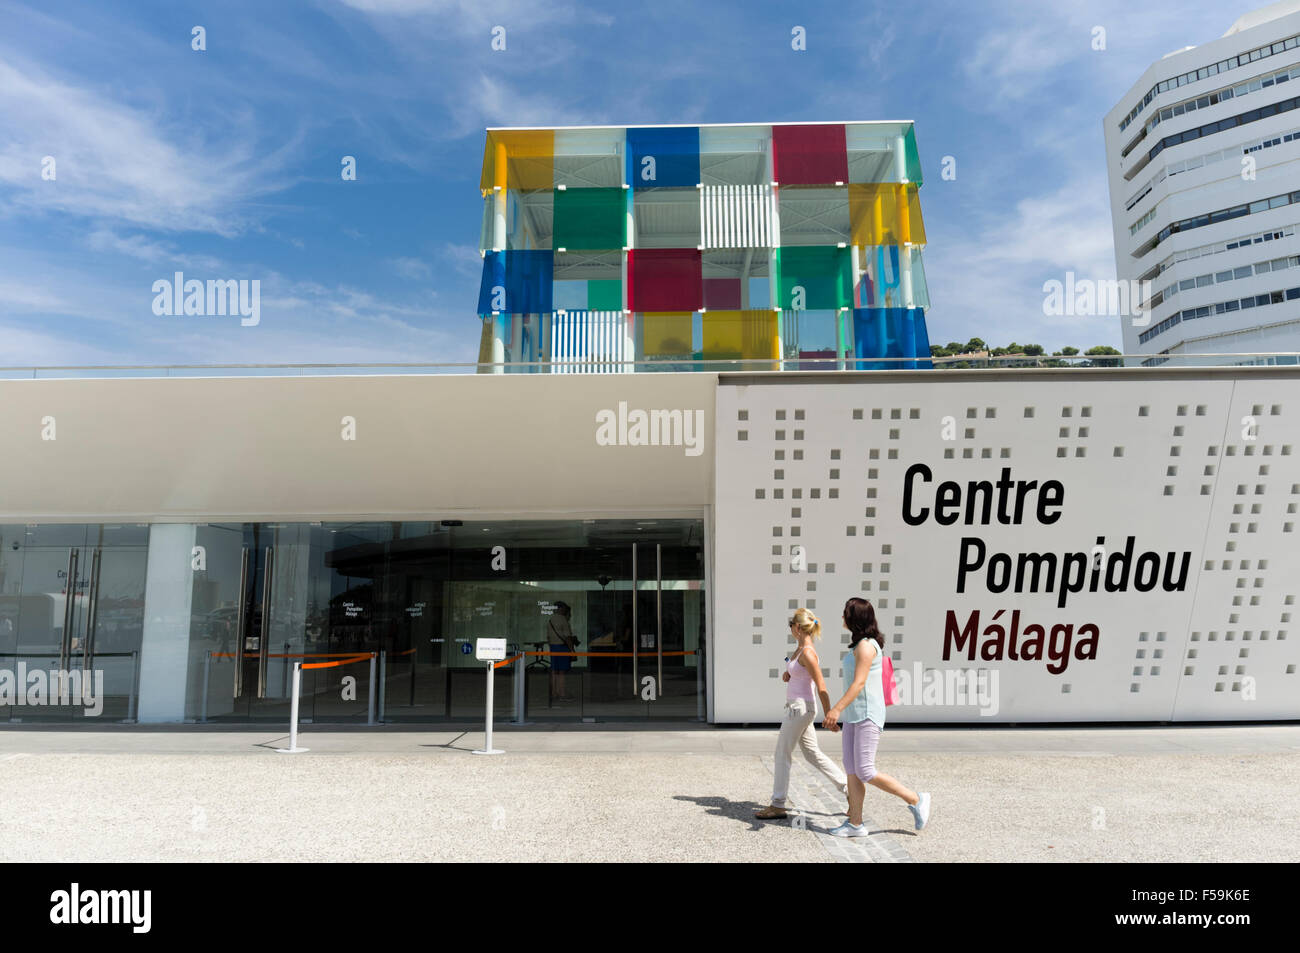 Malaga, Espagne. Centre Pompidou Málaga. Photo Stock